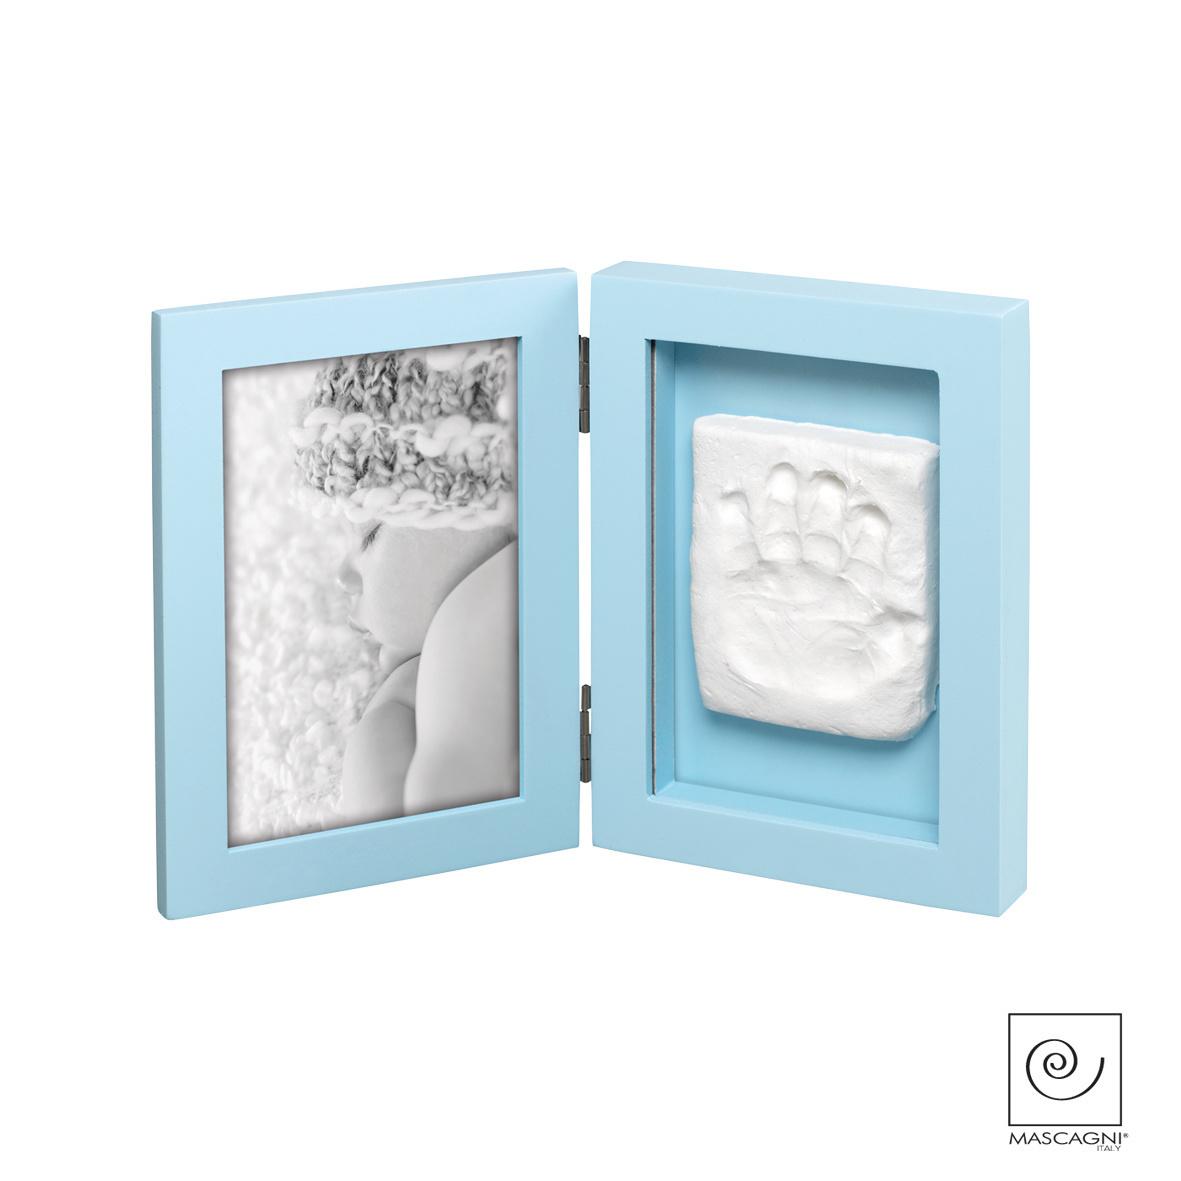 Art Mascagni A621 MULTIPLE FRAME 10X15 - COL. BLEU